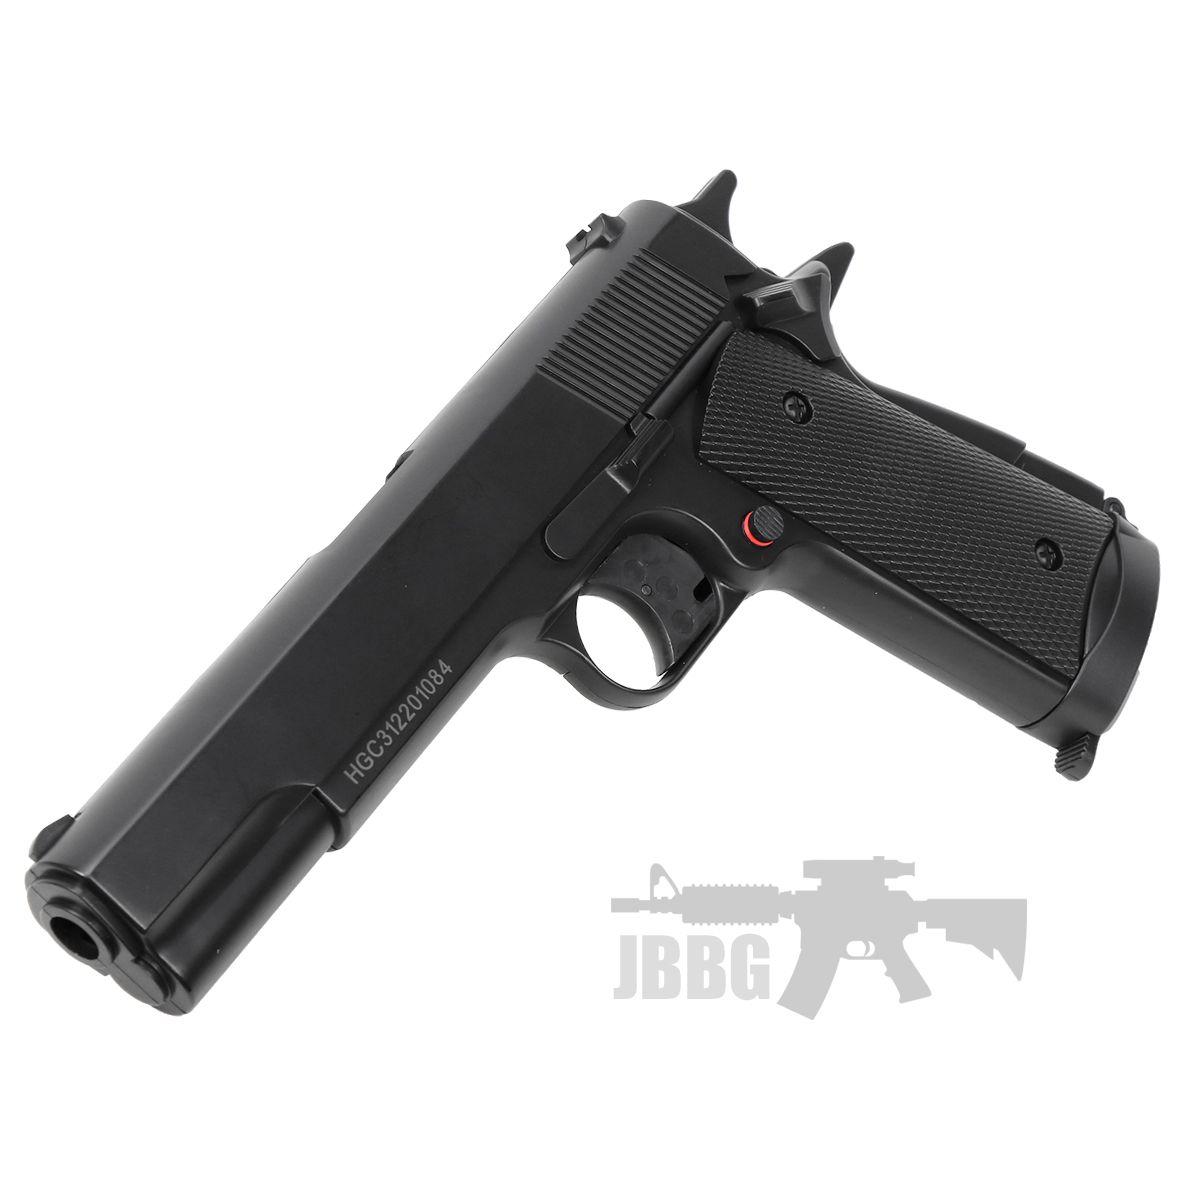 hgc312 airsoft gas pistol jbbg 25 1